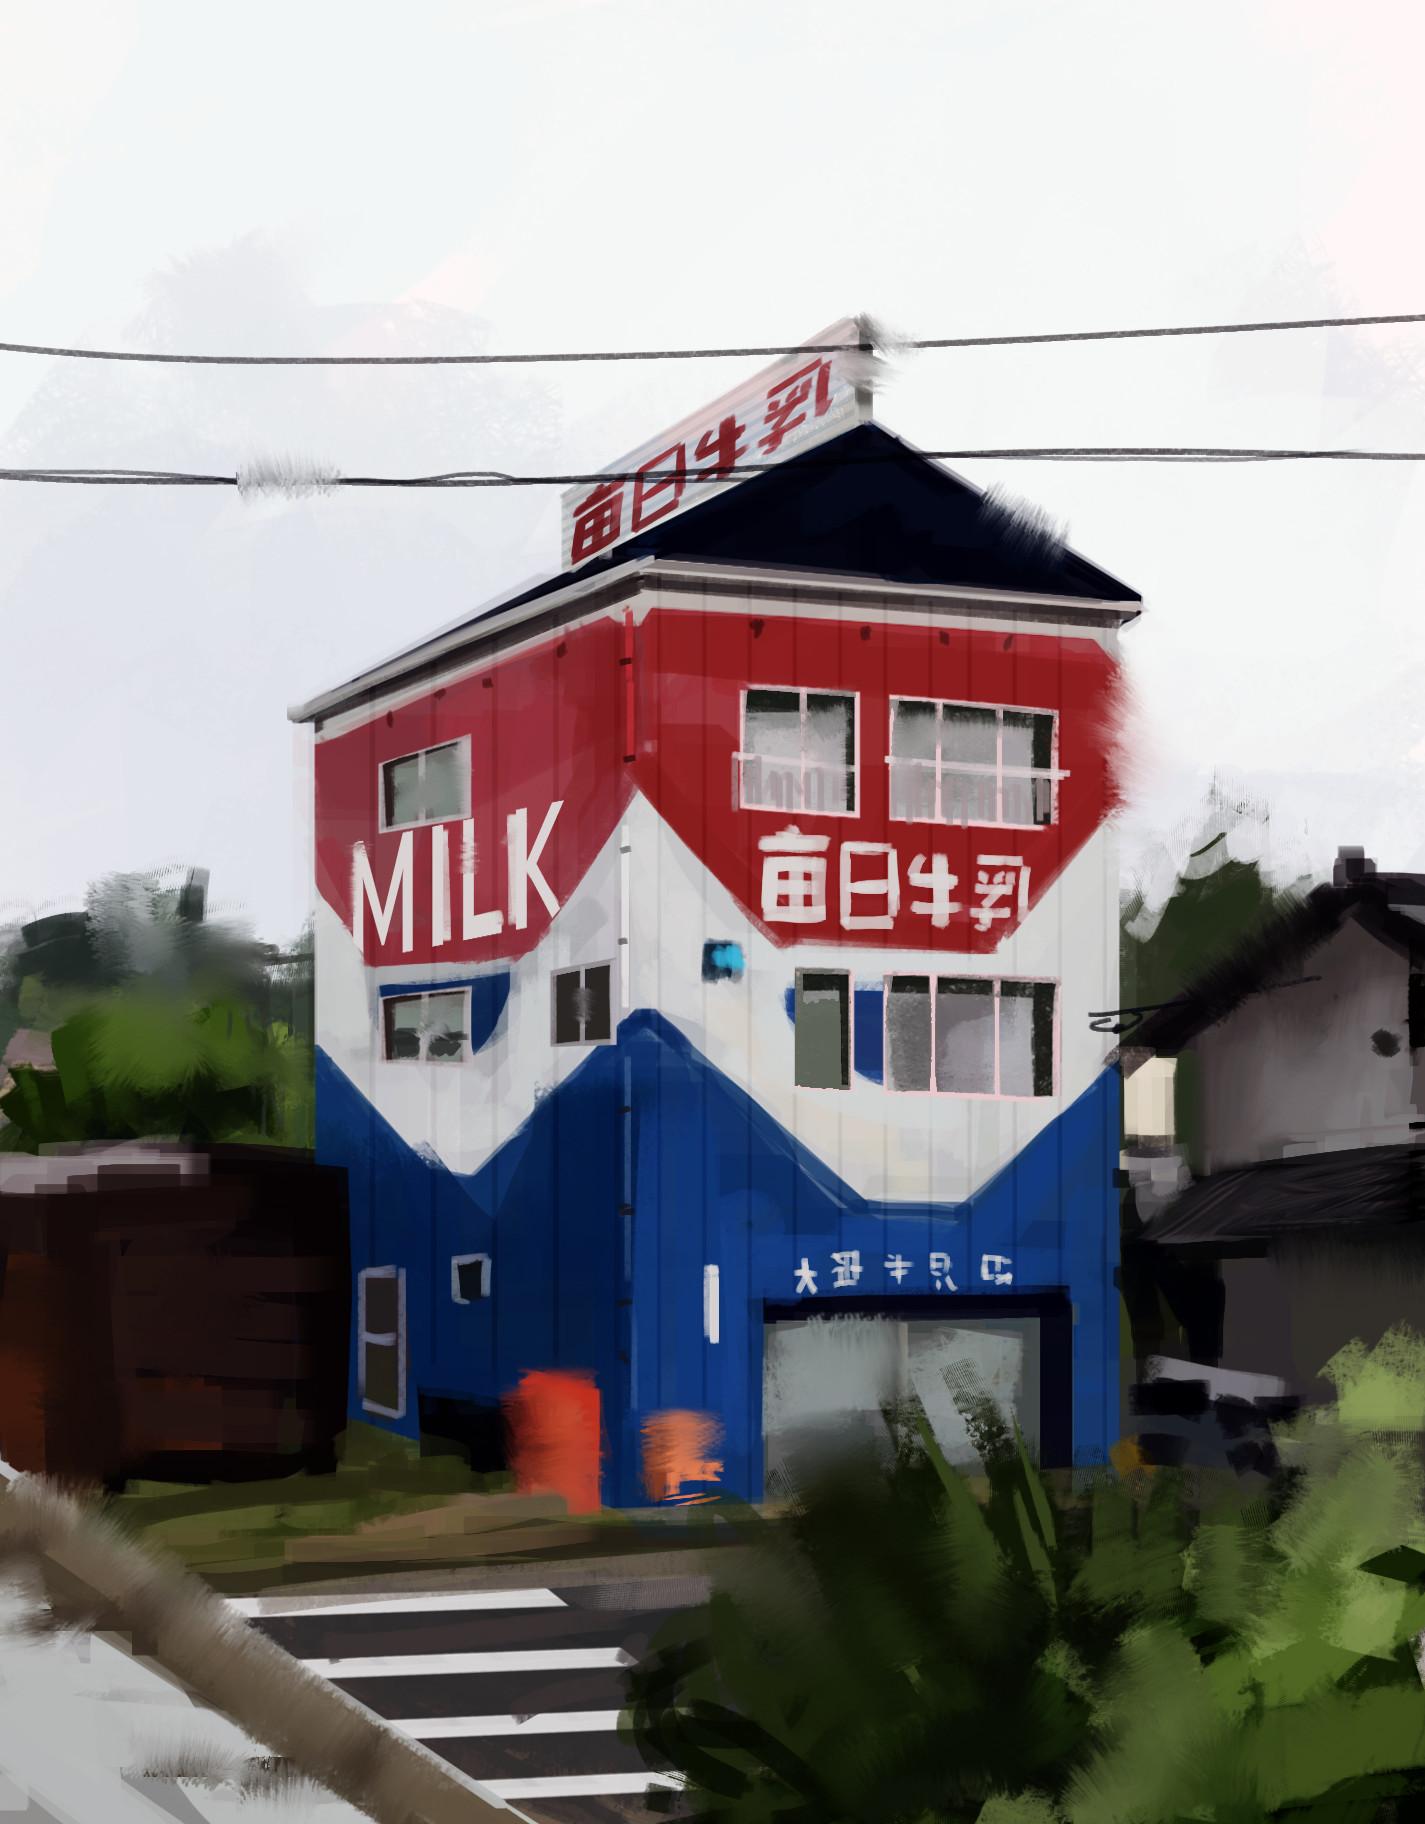 Jack dowell milkhouse